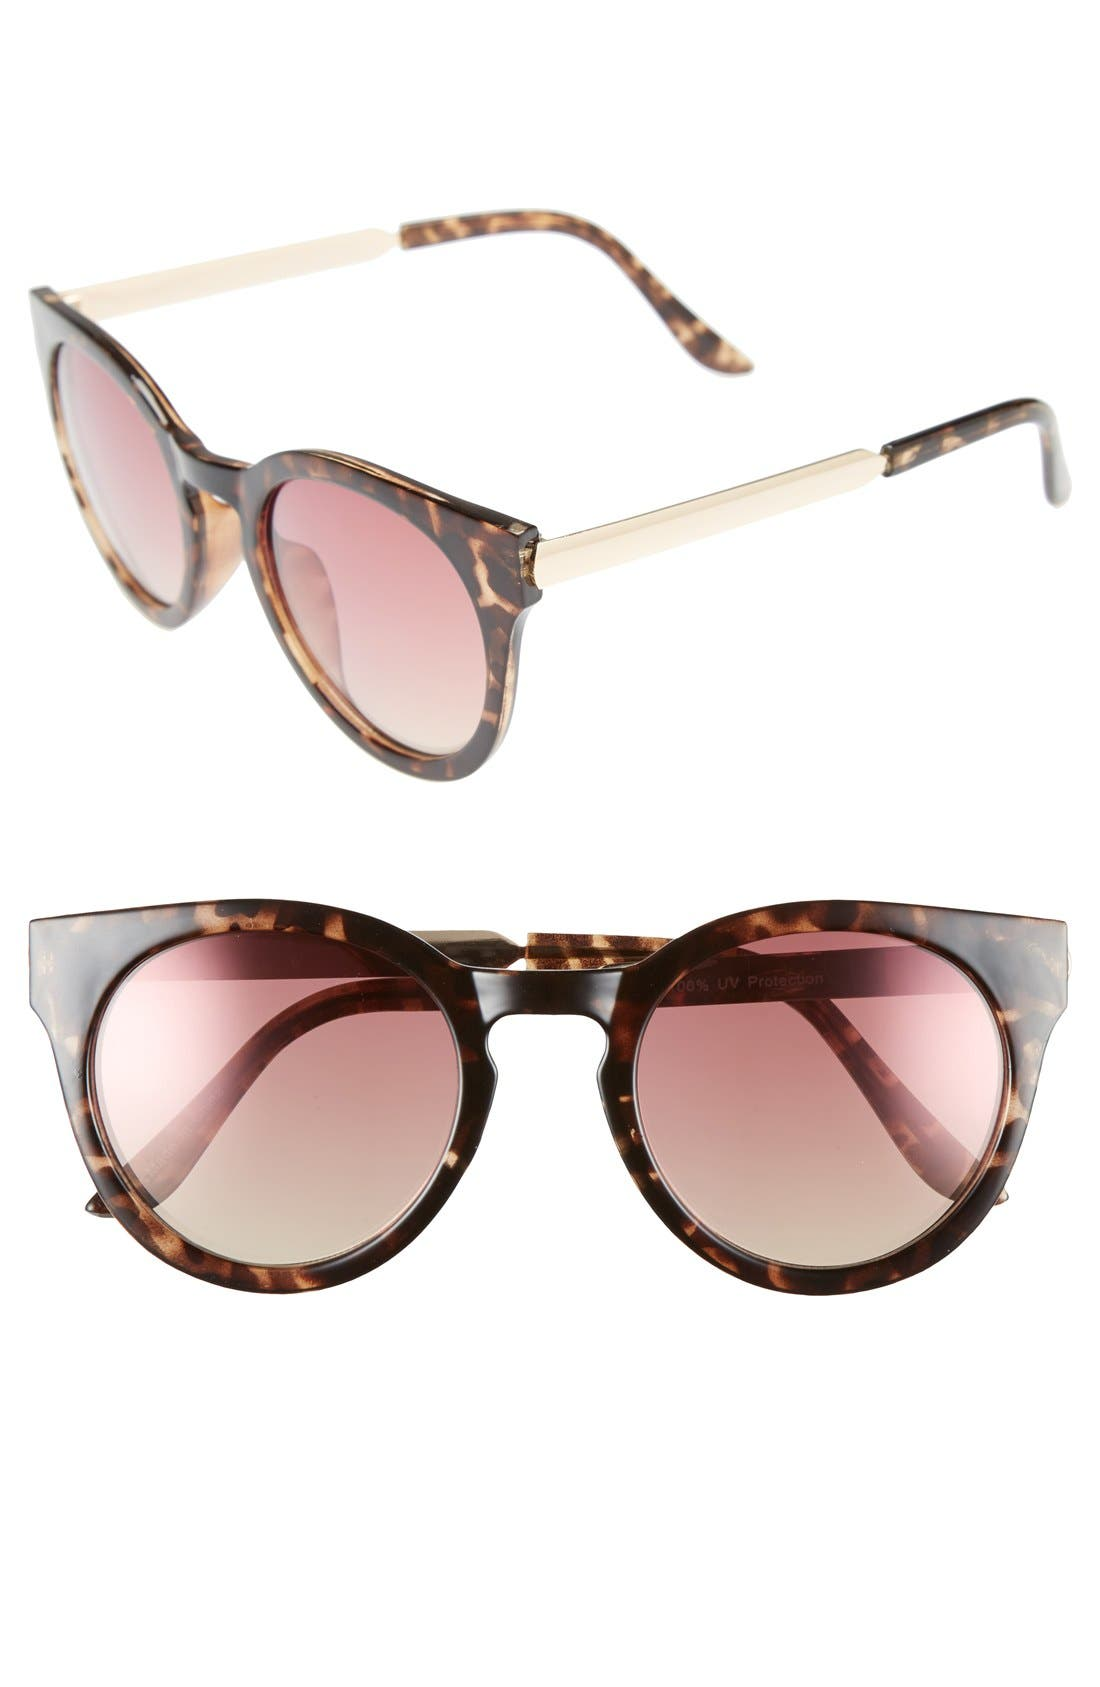 Alternate Image 1 Selected - BP. 55mm Mirrored Round Sunglasses